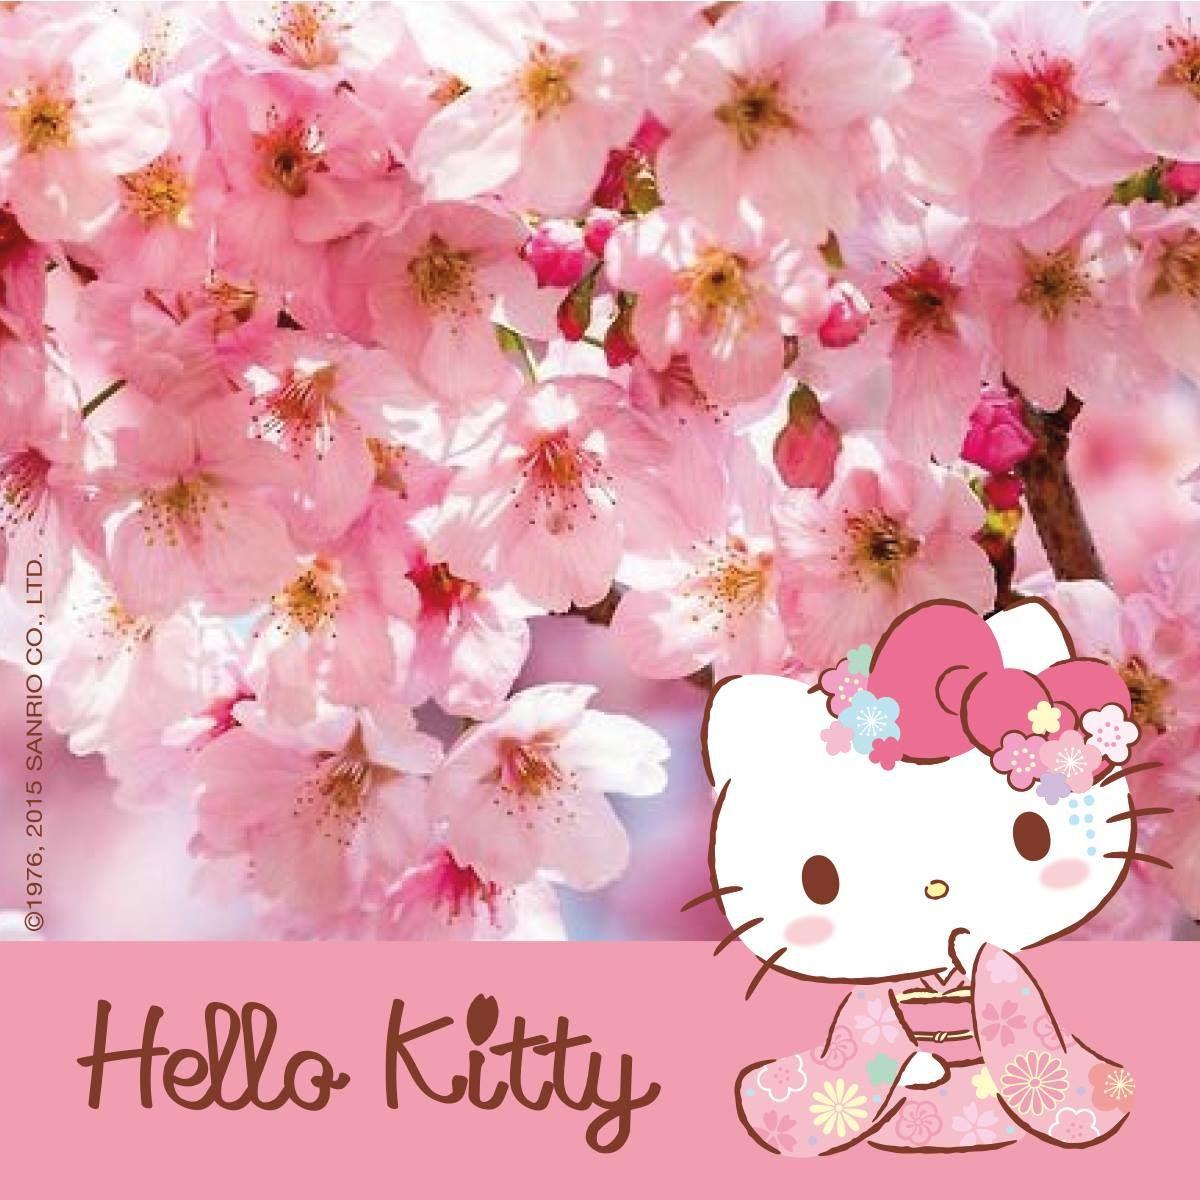 Best Wallpaper Hello Kitty Sakura - 4c0ef8b18c2539f6c7e0278ee2ecbd52  HD_419392.jpg